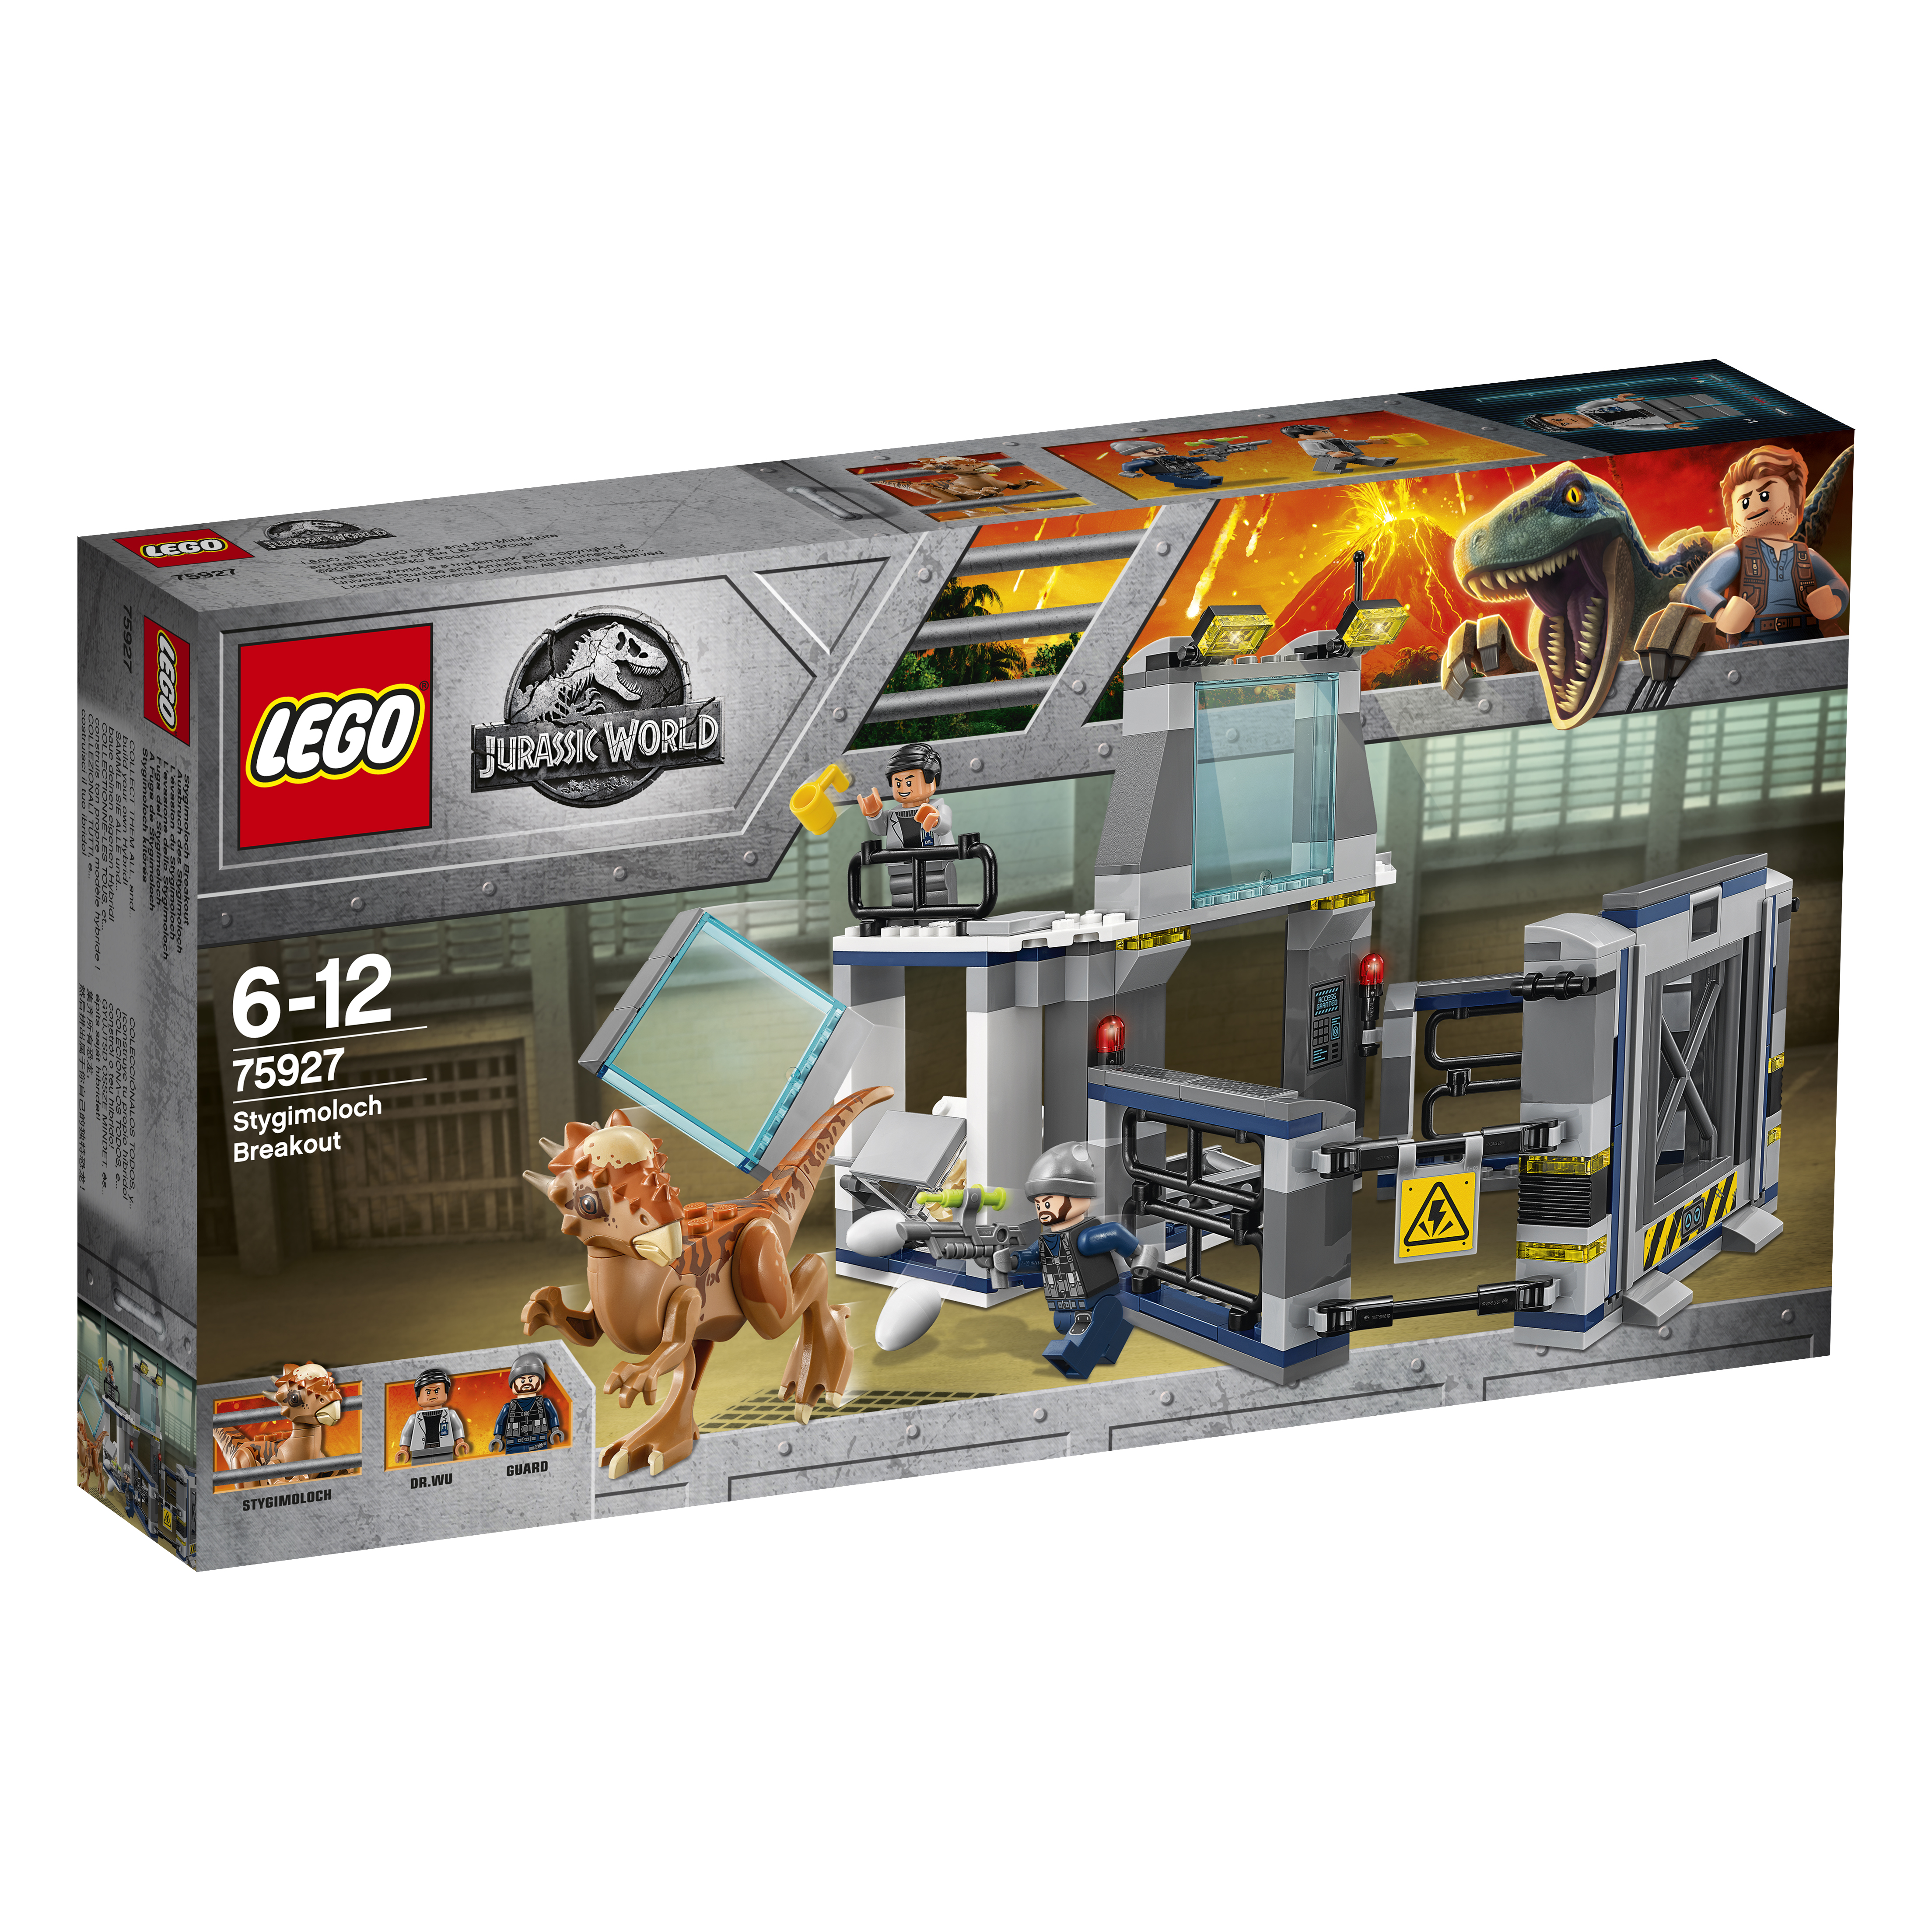 Конструктор LEGO Jurassic World 75927 Побег стигимолоха из лаборатории lego jurassic world team pack